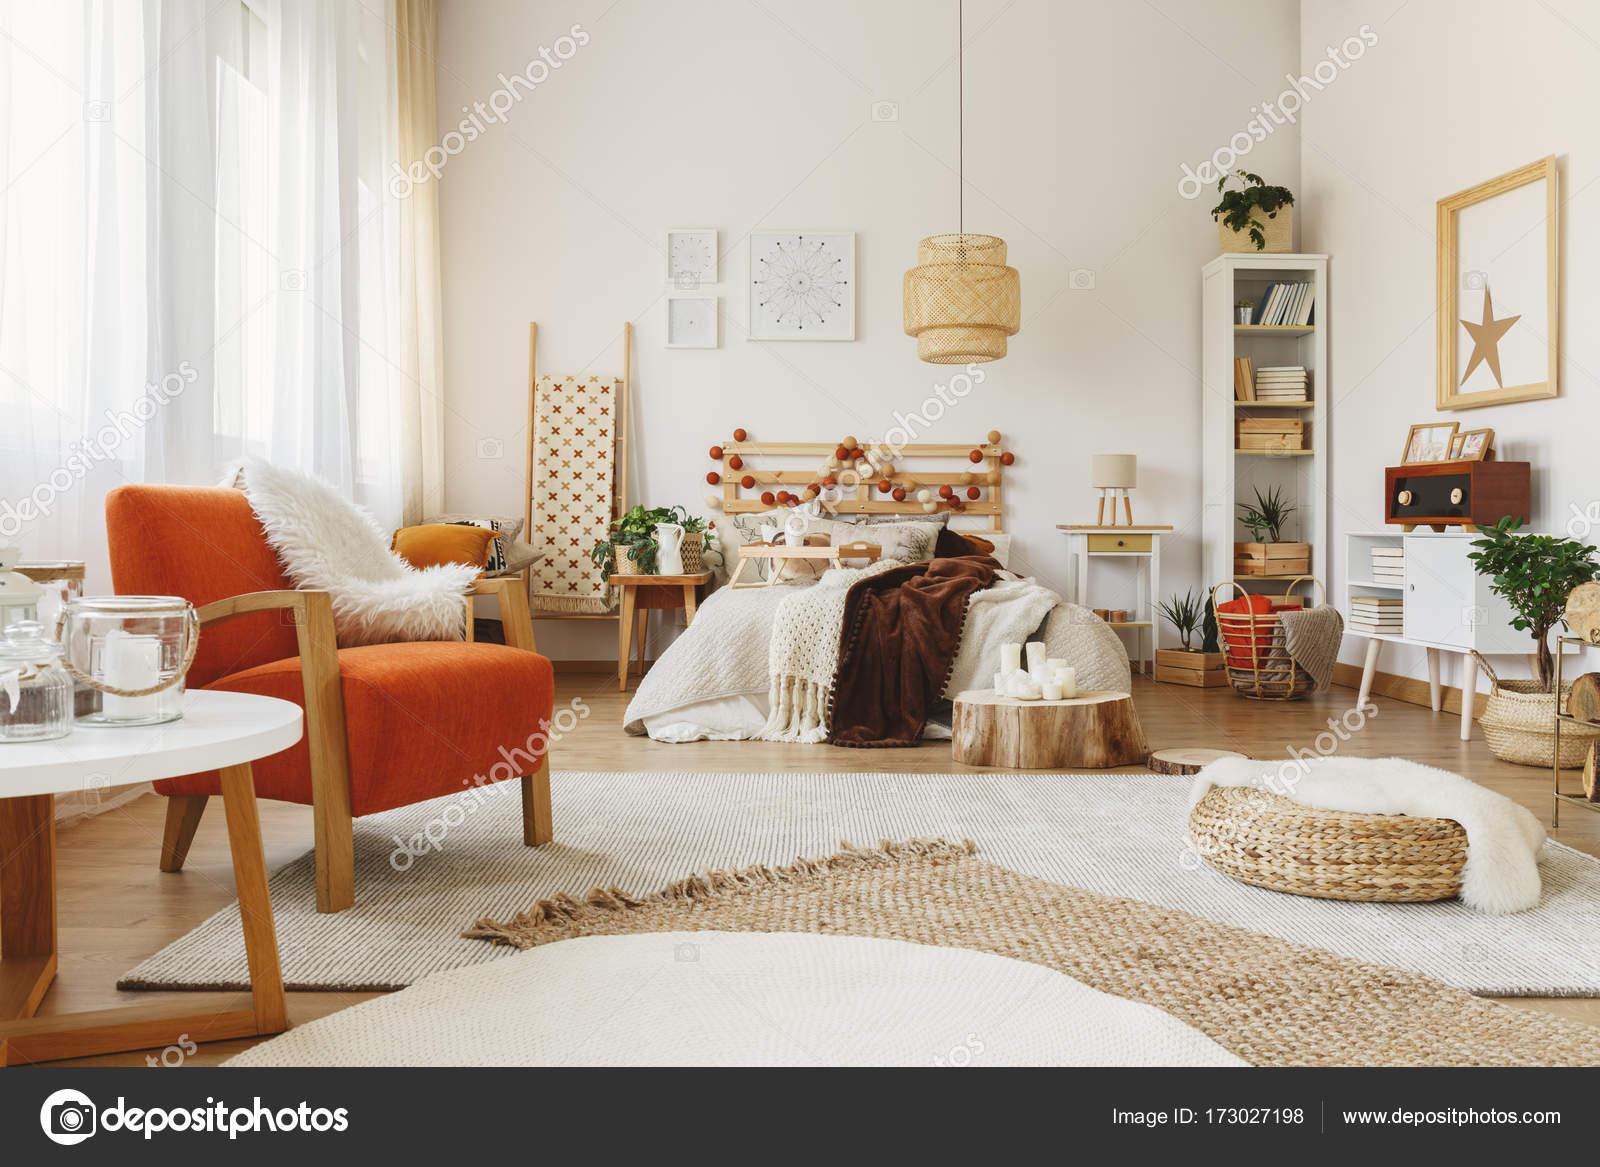 Camera da letto arredata scandinavo — Foto Stock © photographee.eu ...